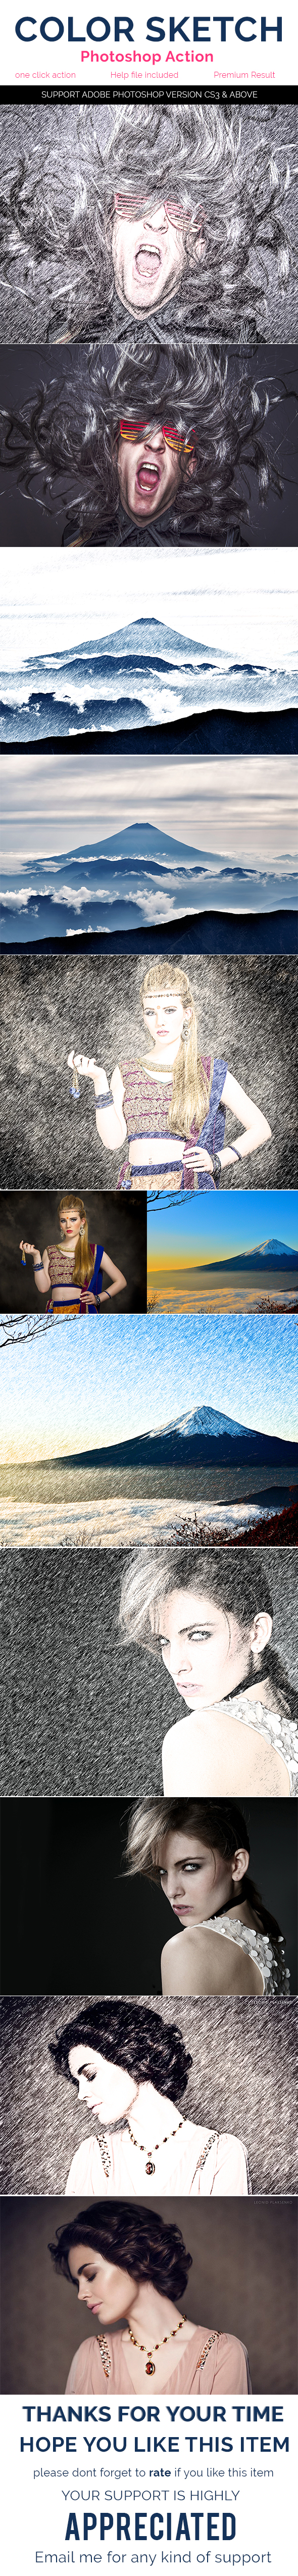 GraphicRiver Color Sketch Photoshop Action 20375755